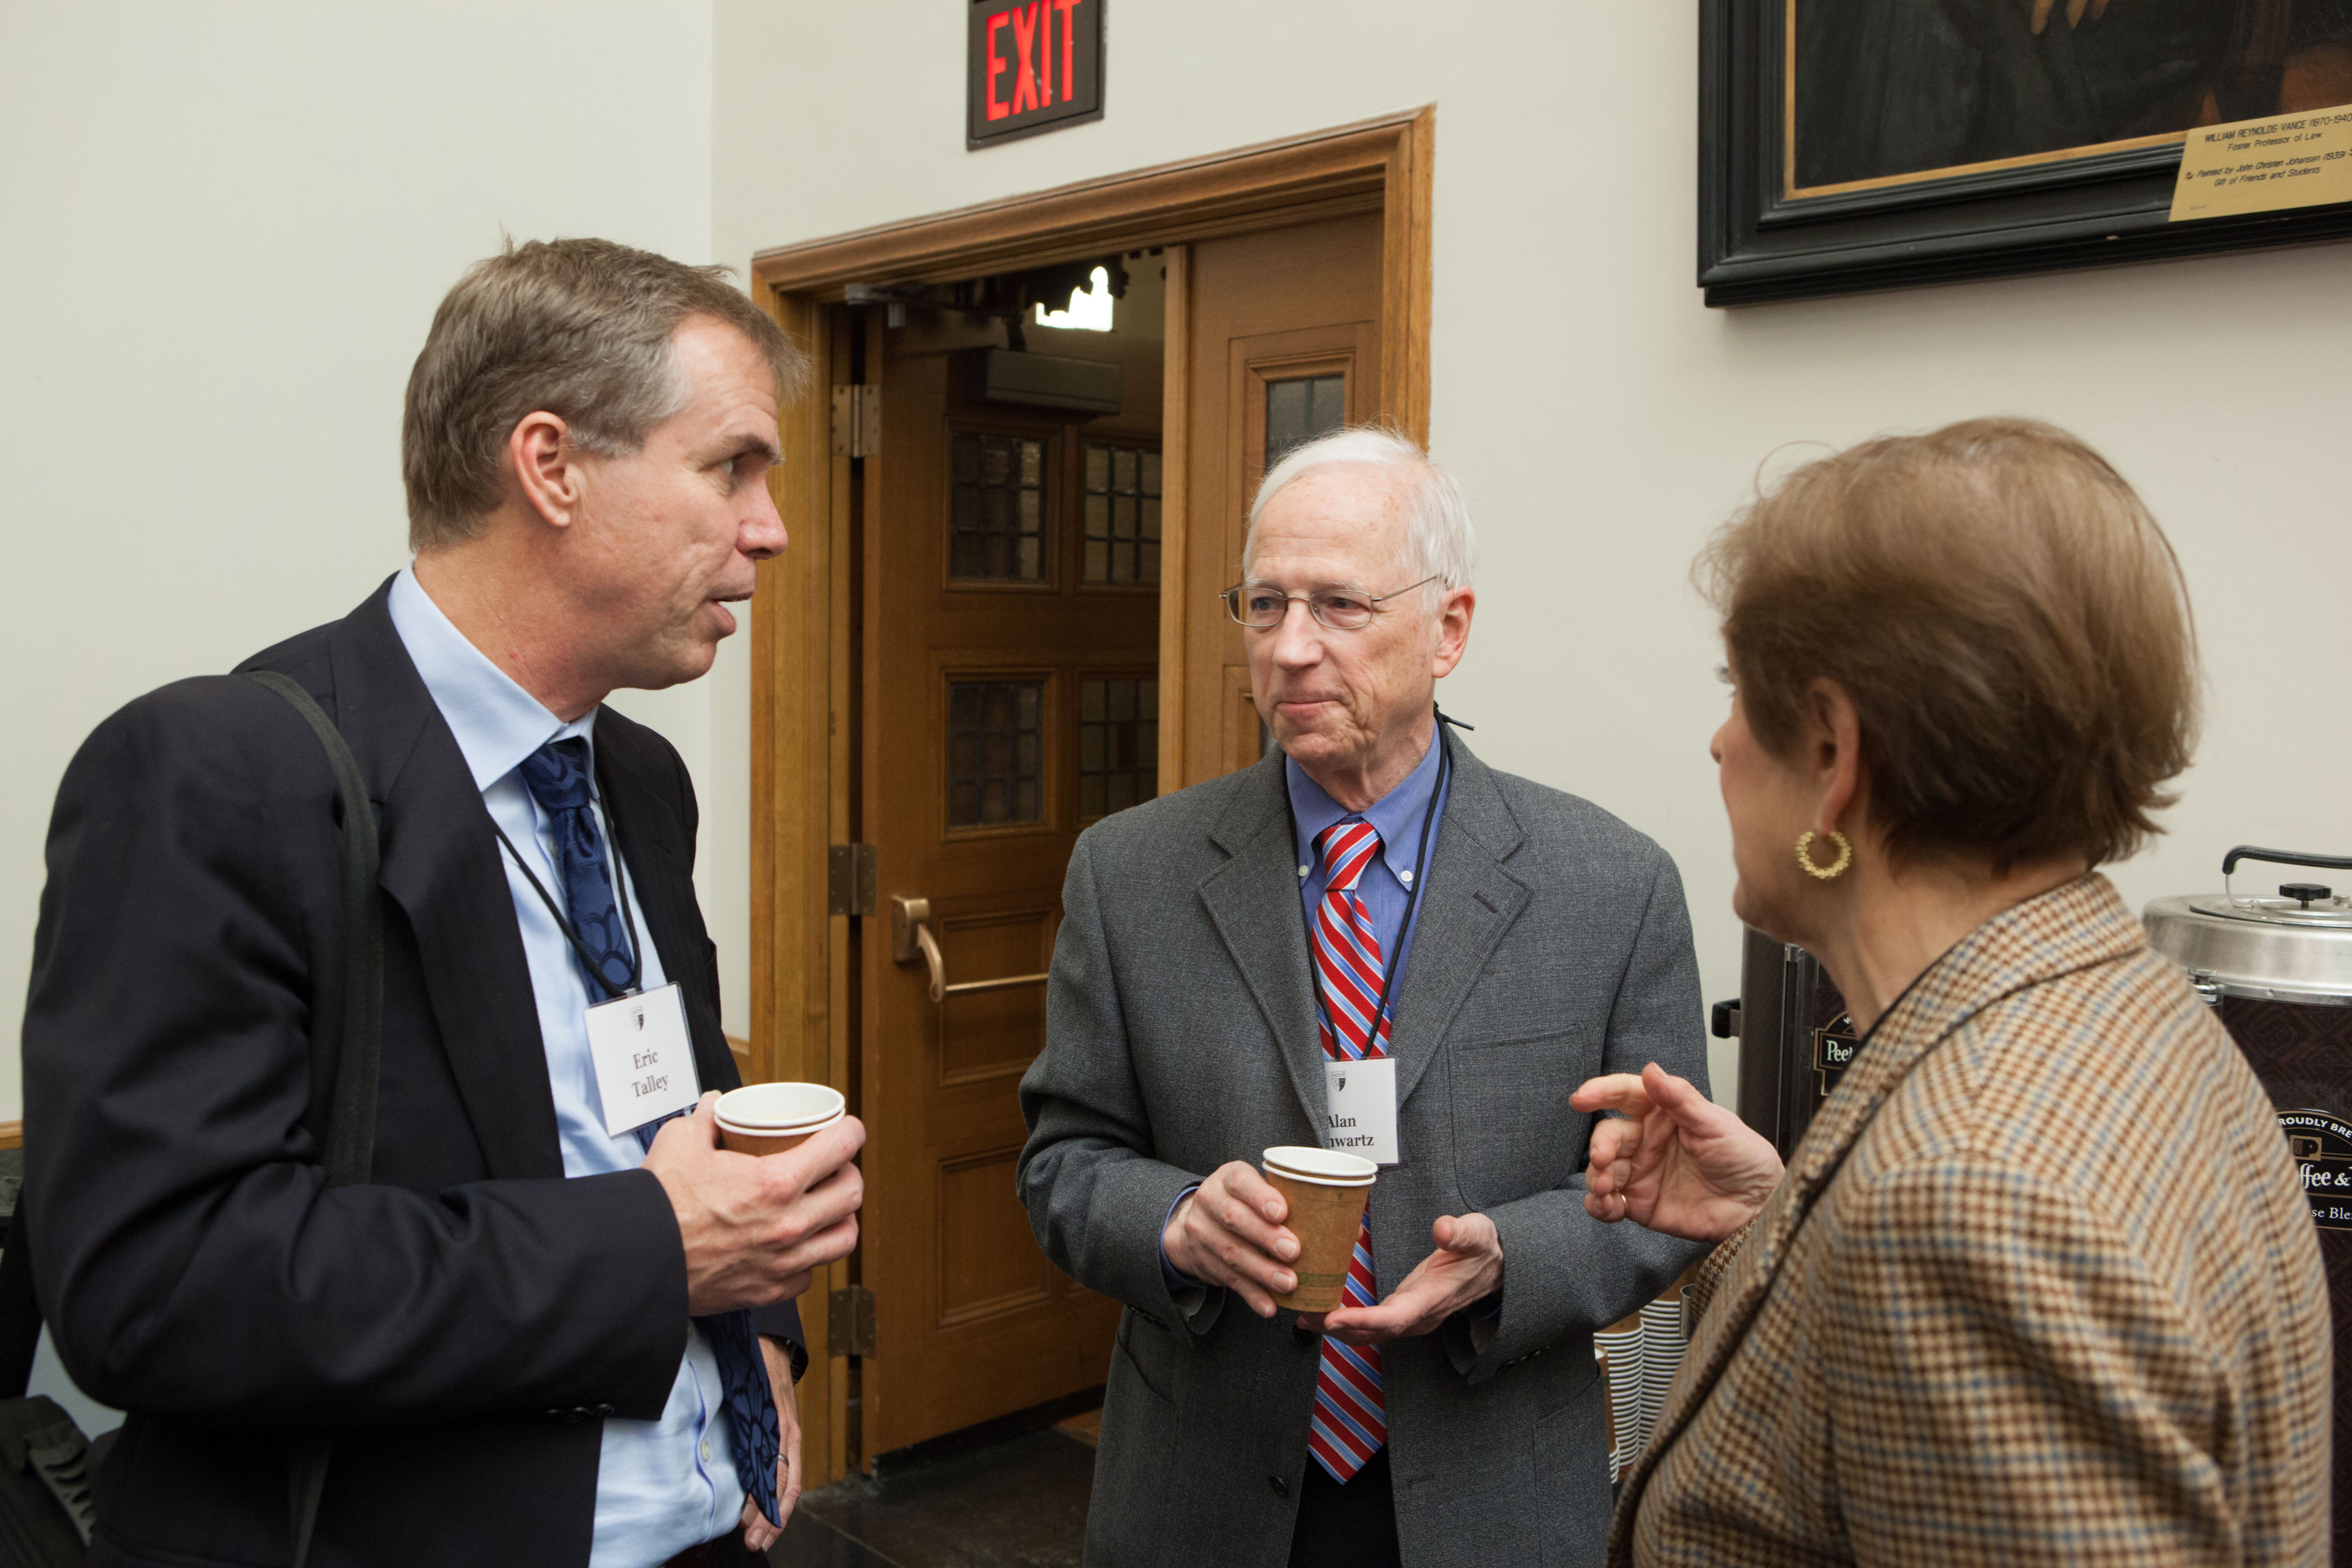 Berkeley Law Prof. Eric Talley, YLS Prof. Alan Schwartz '64, and Barbara Paul Robinson '65